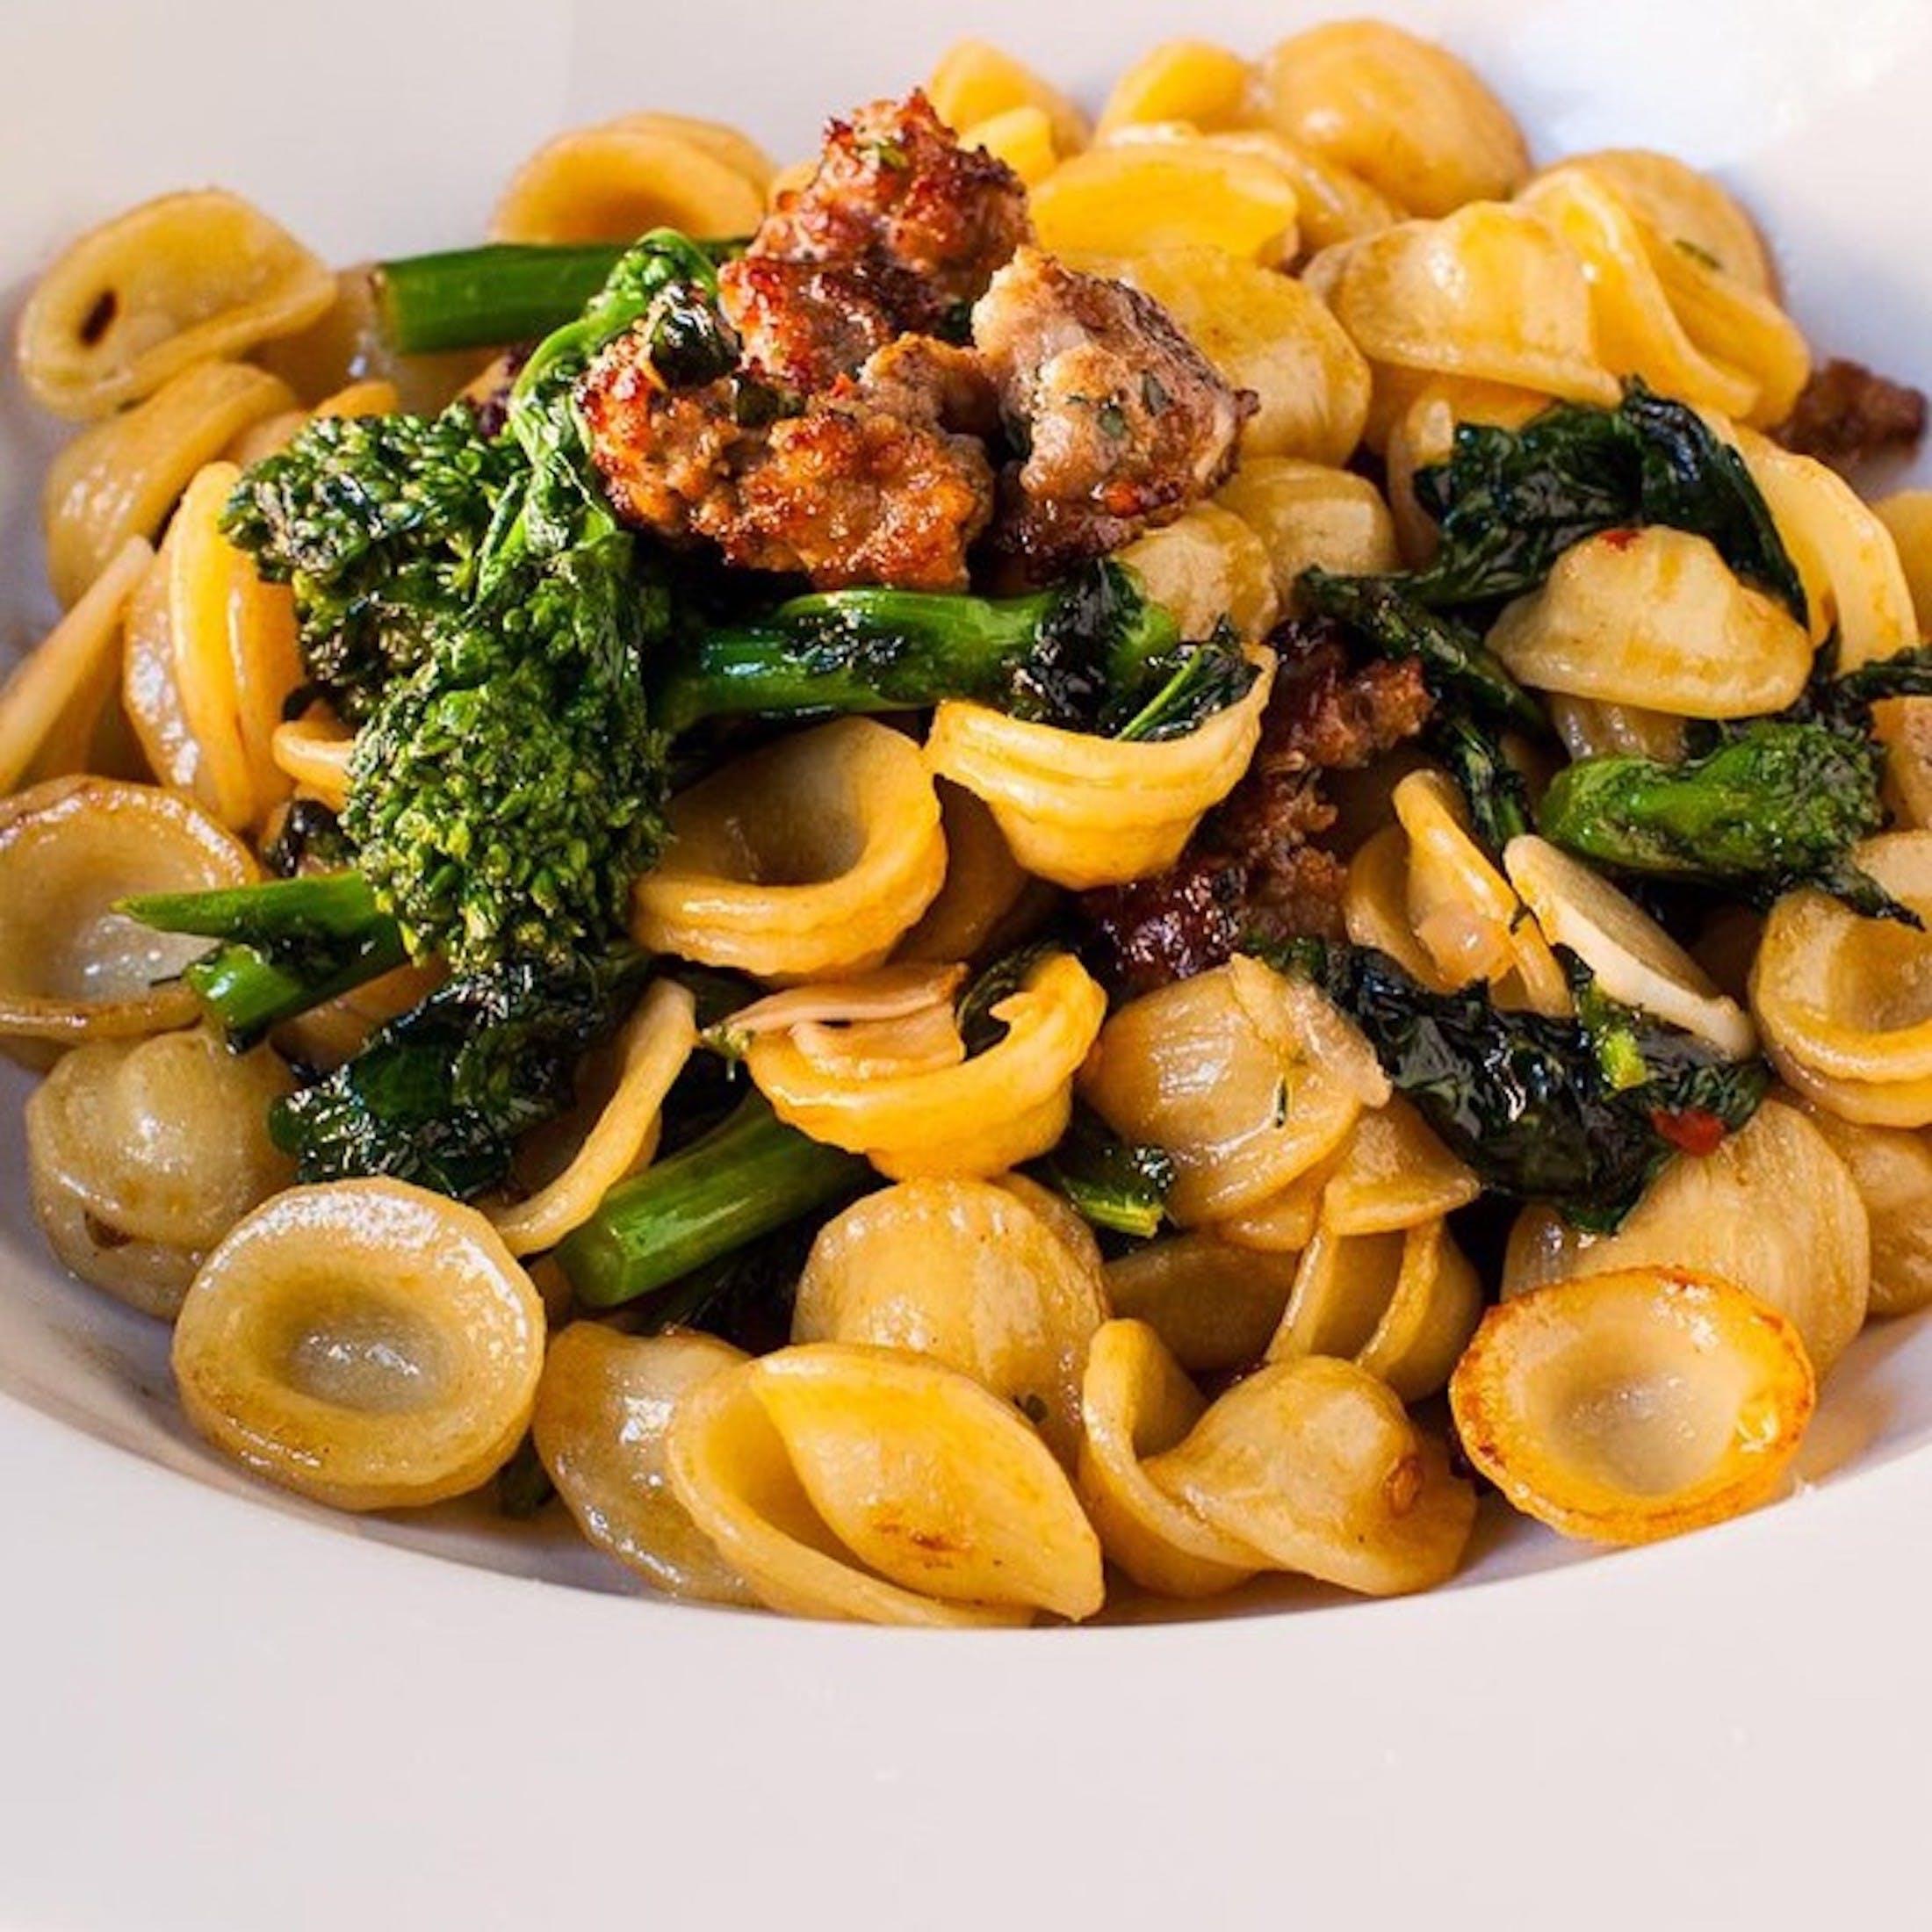 Free stock photo of food, vegetables, italian, dinner